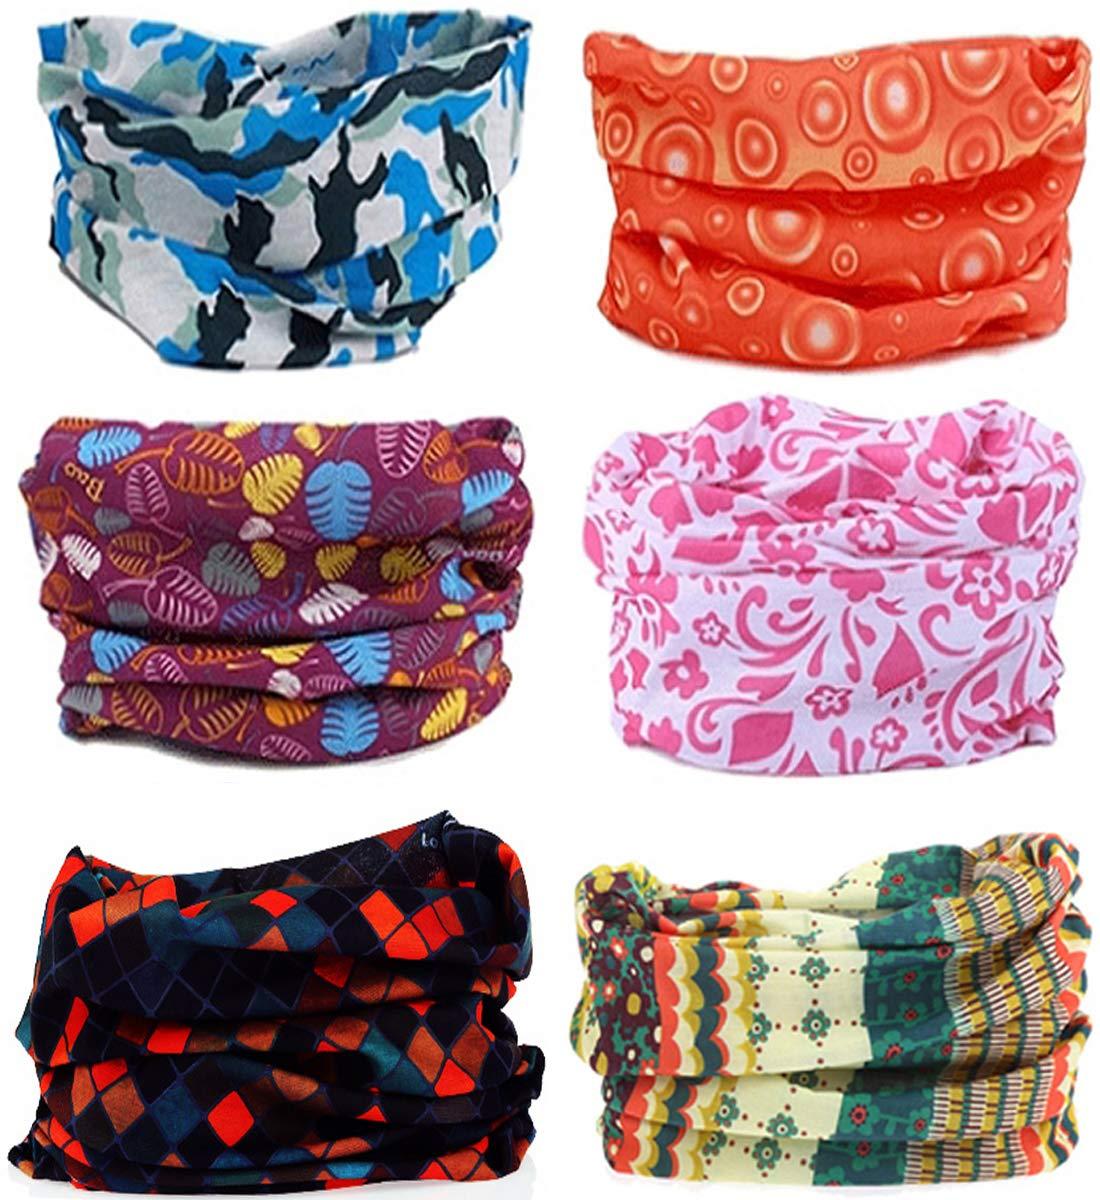 SmilerSmile 6pcs Assorted Seamless Outdoor Sport Bandanna Headwrap Scarf Wrap, 12 in 2 High Elastic Magic Headband & Collars Muffler Scarf Face Mask UV Resistance(33 Print4)